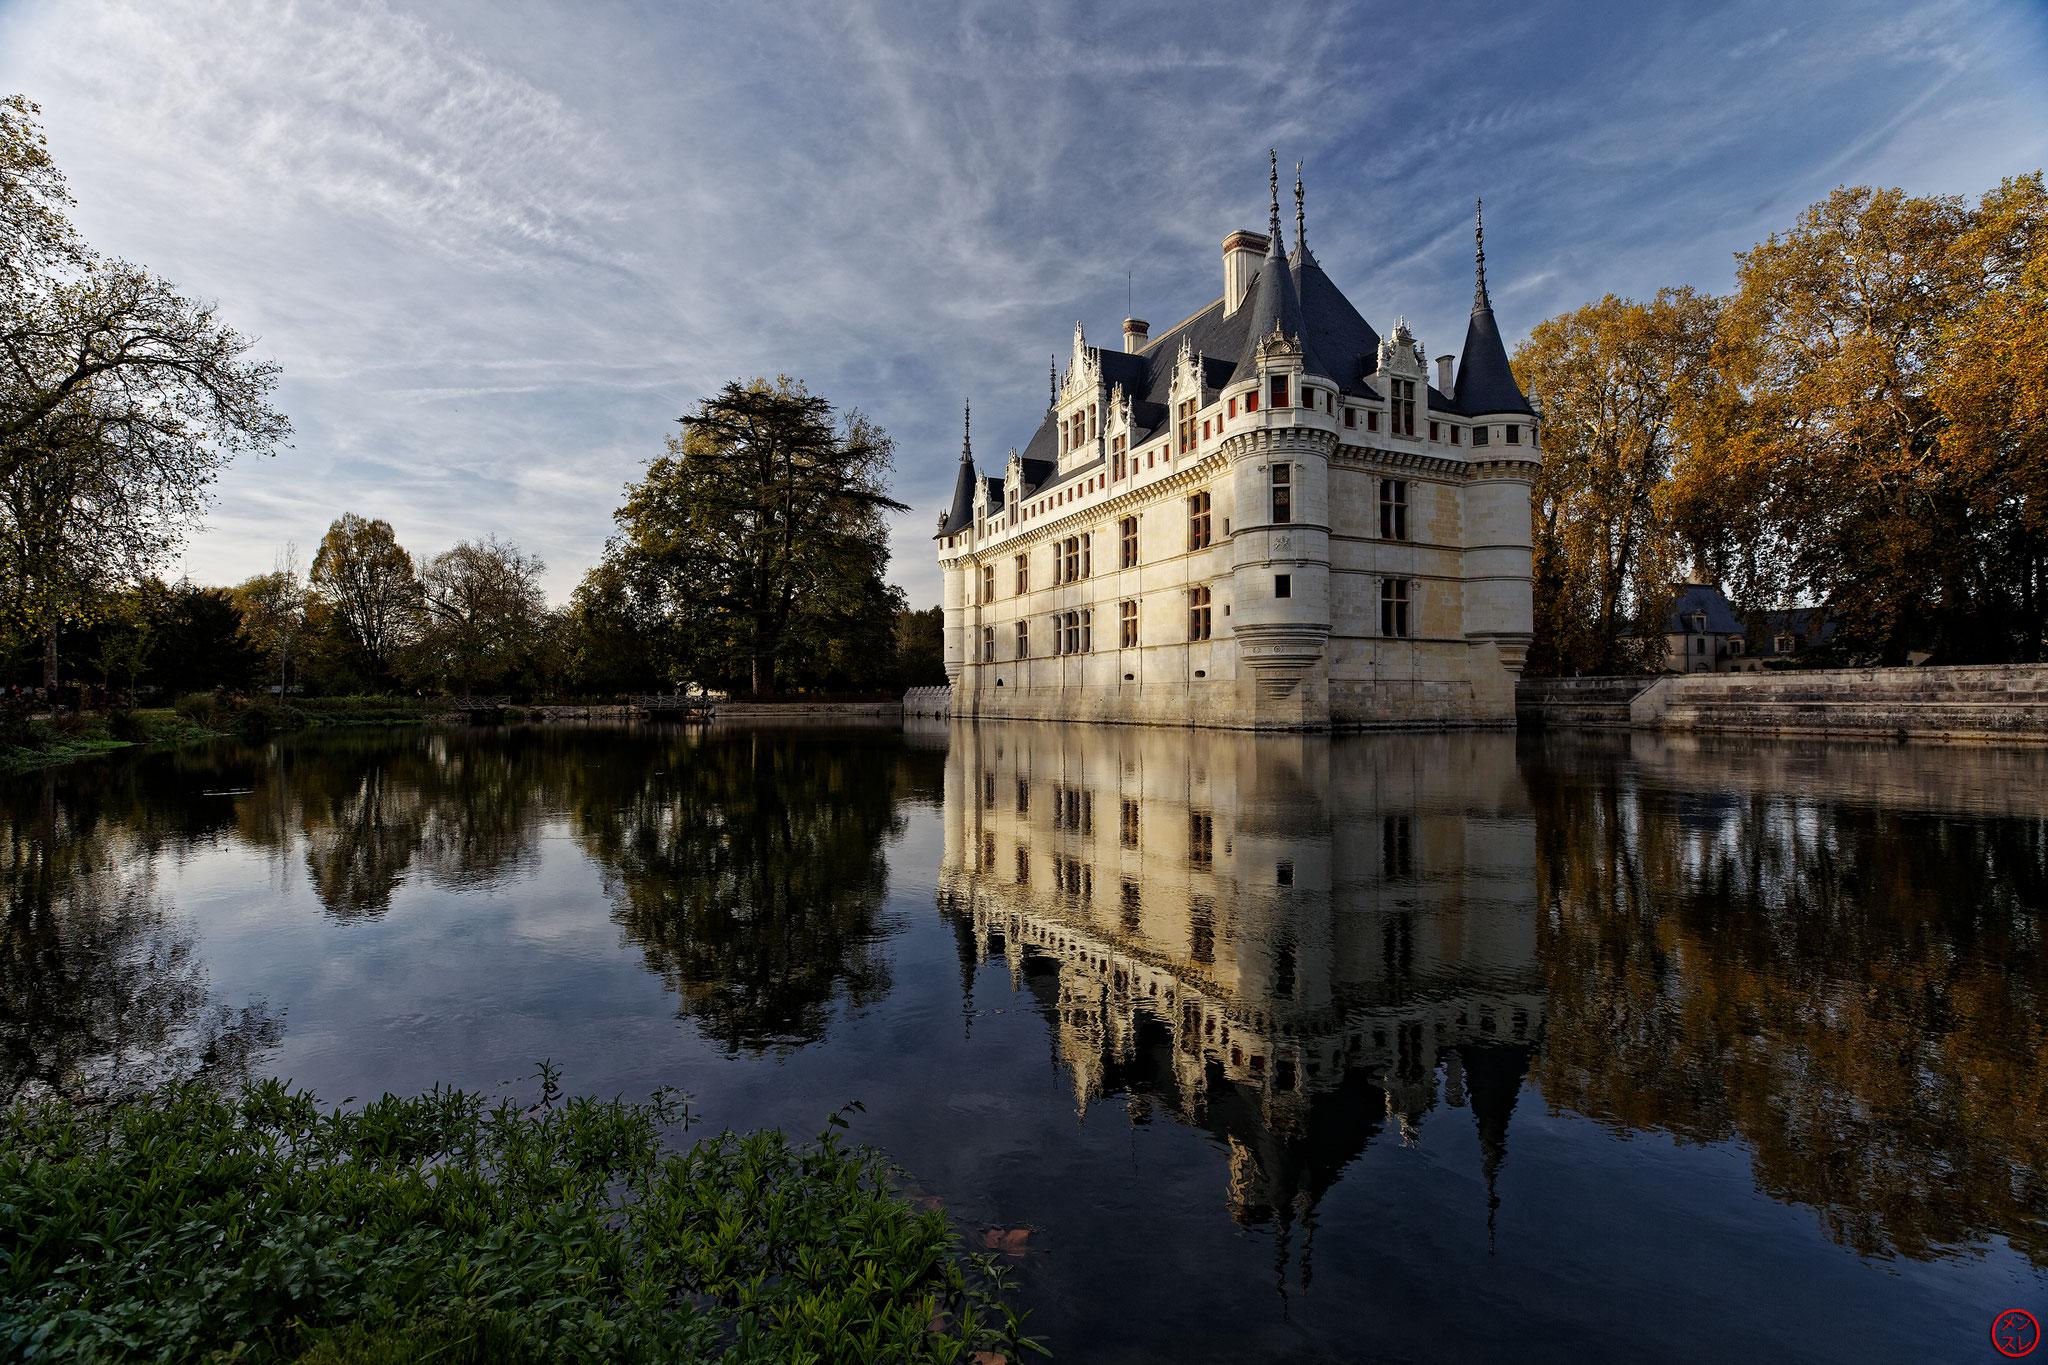 Château d'Azay-le-Rideau, 31 octobre 2017